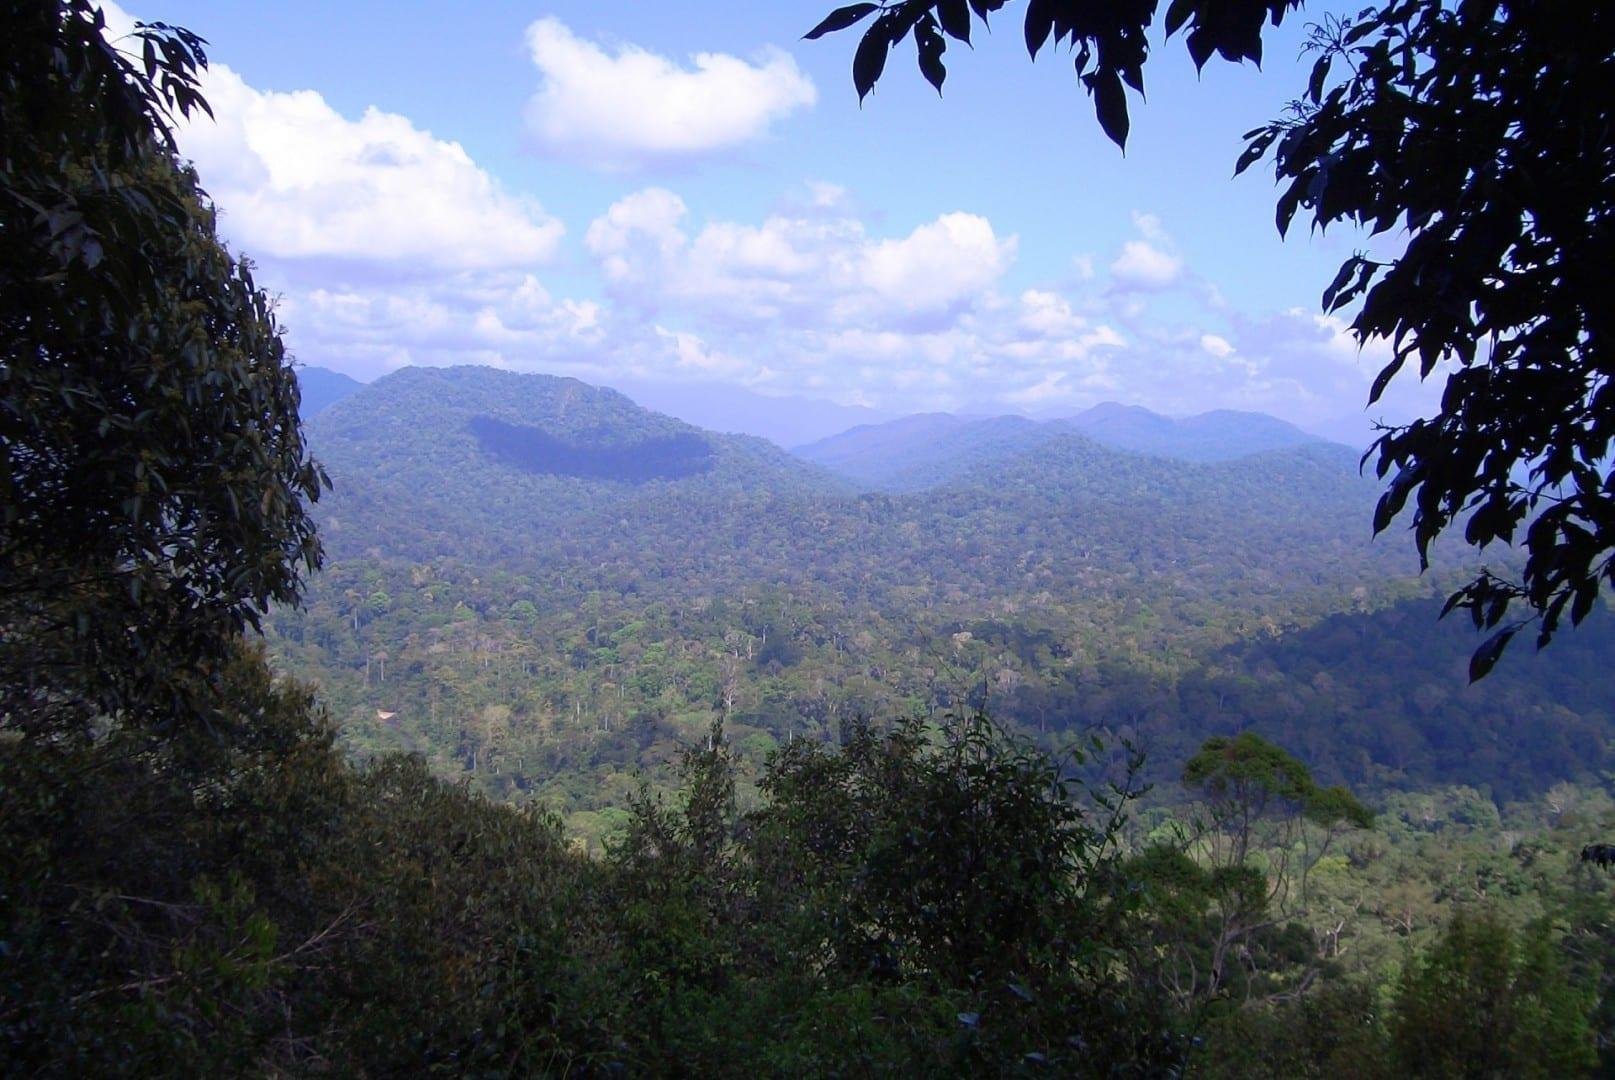 Teresek Hill, Taman Negara Taman Negara Malasia